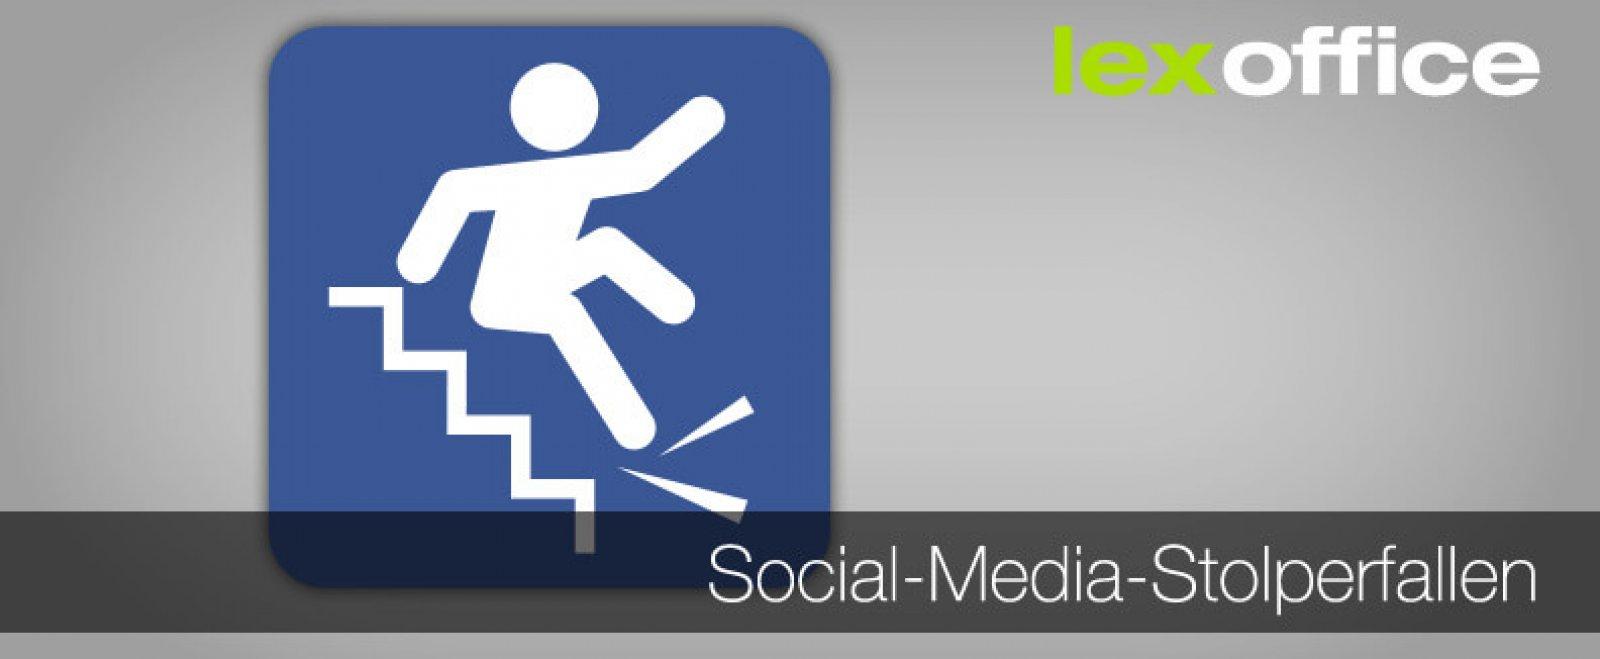 Typische Social-Media-Stolperfallen